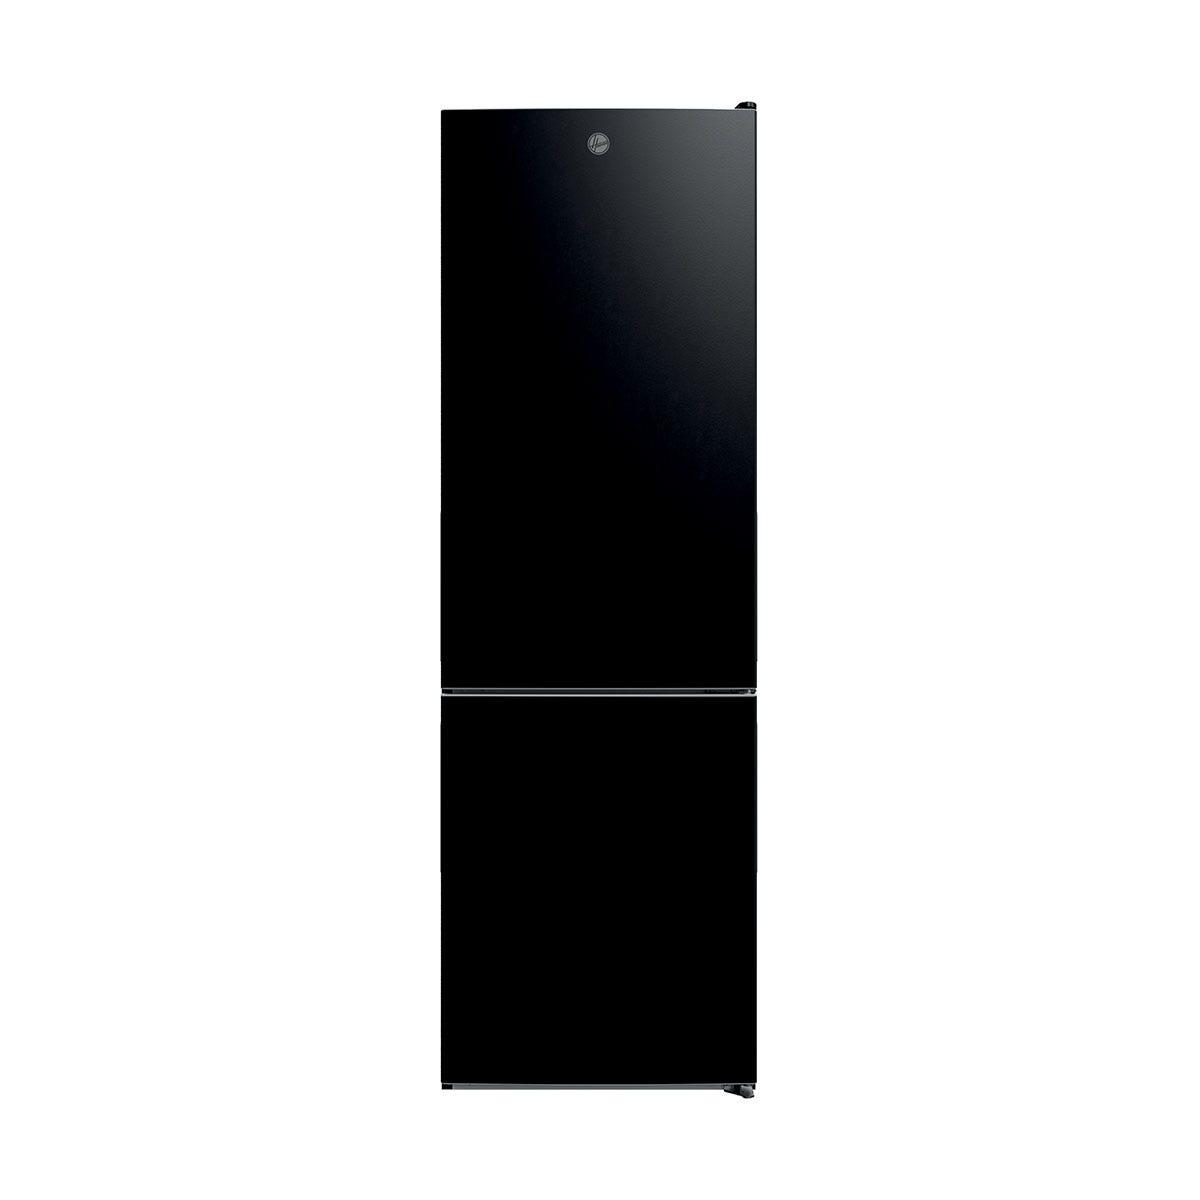 Hoover HMDNB 6184BK 60cm 302L Total No Frost Fridge Freezer - Black